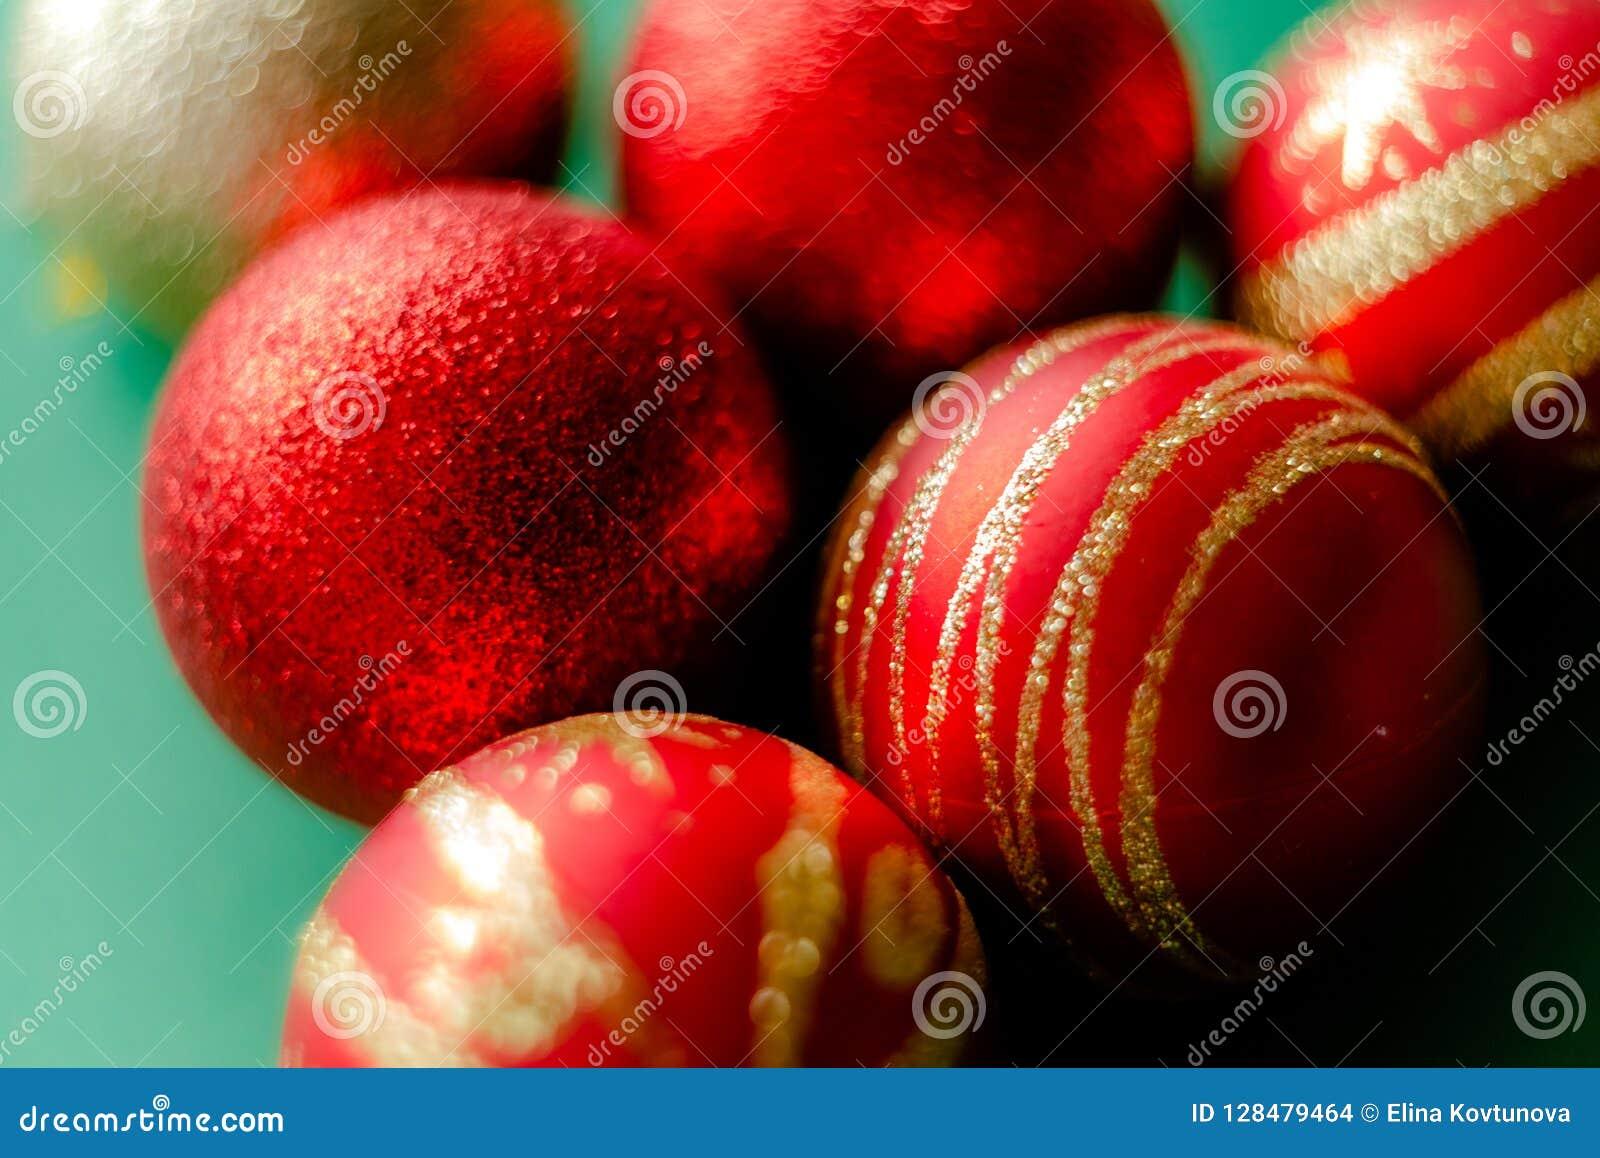 New Year Decorations Christmas Balls Stock Photo - Image ...